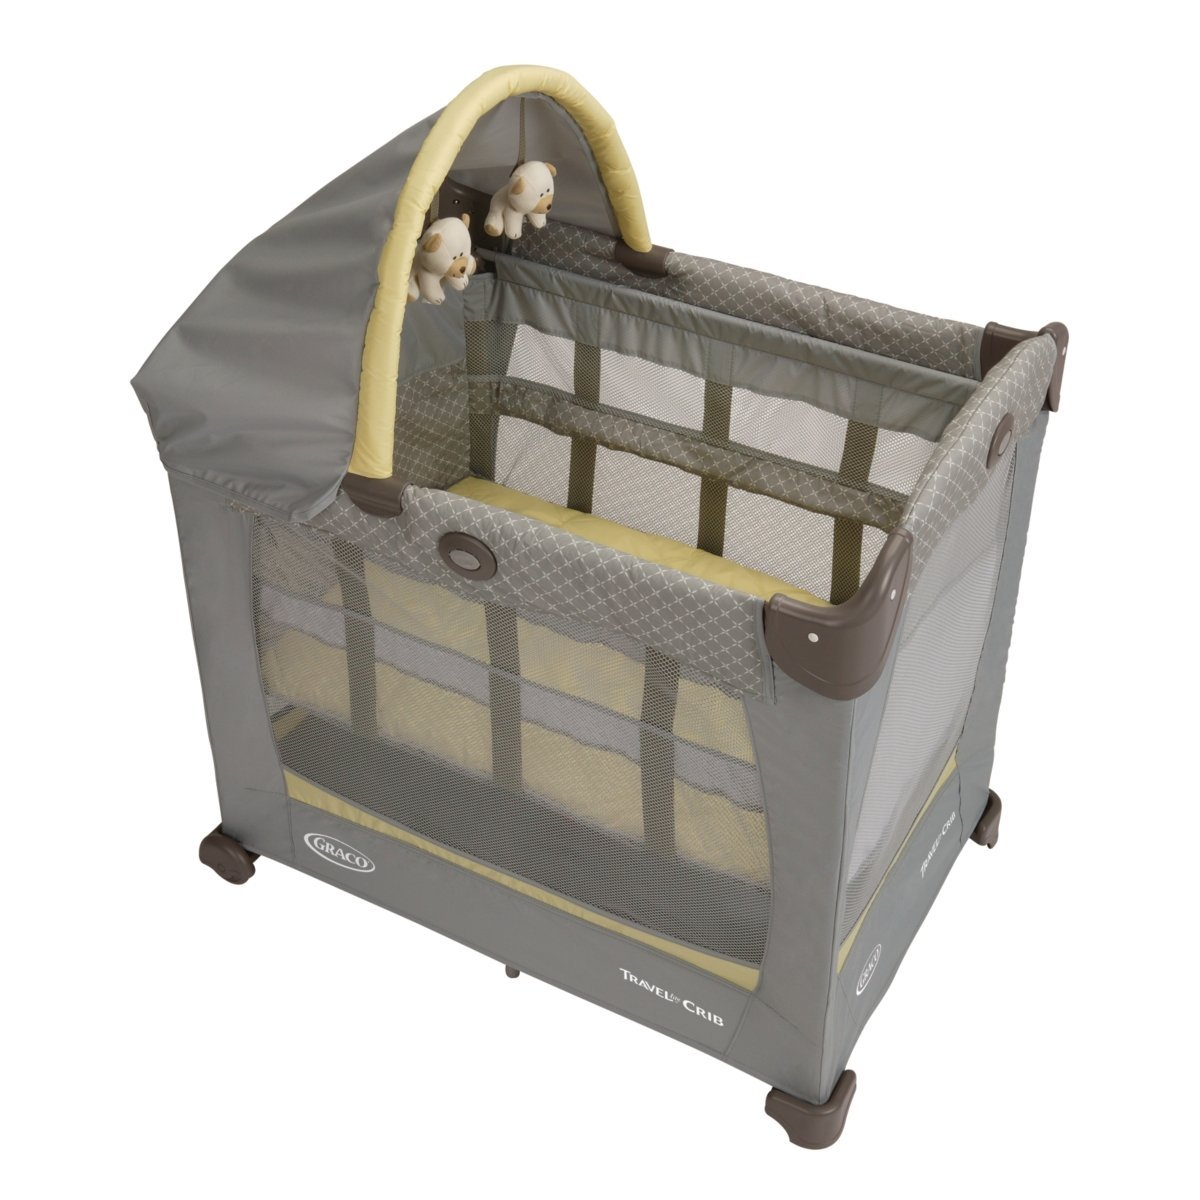 Graco crib for sale manila - Baby Cribs Graco Graco Travel Lite Crib